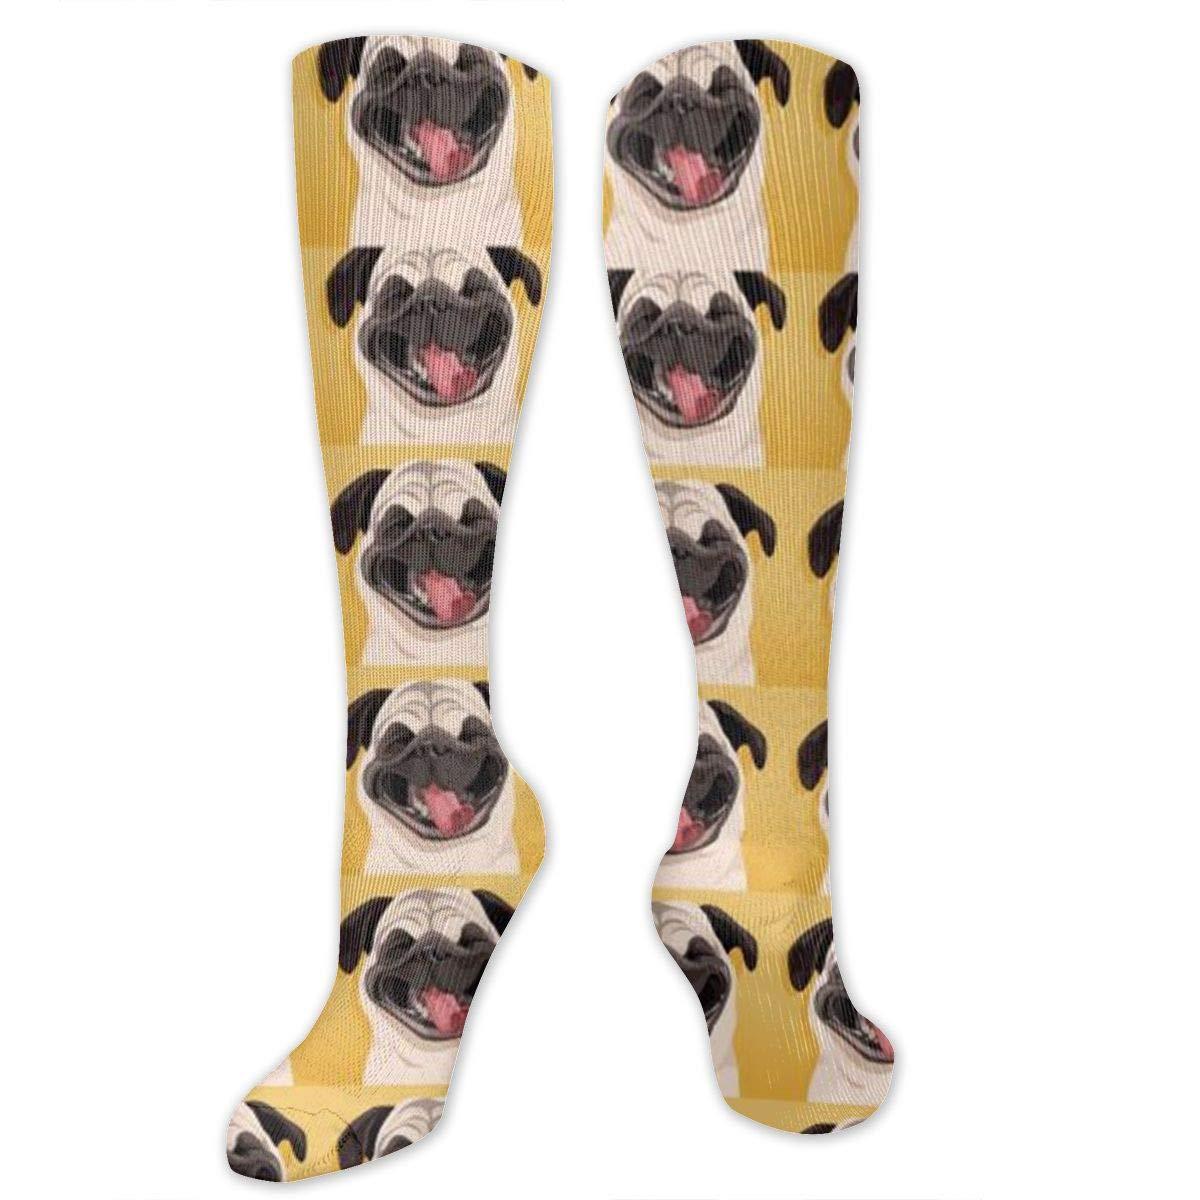 Chanwazibibiliu Pug Mens Colorful Dress Socks Funky Men Multicolored Pattern Fashionable Fun Crew Cotton Socks